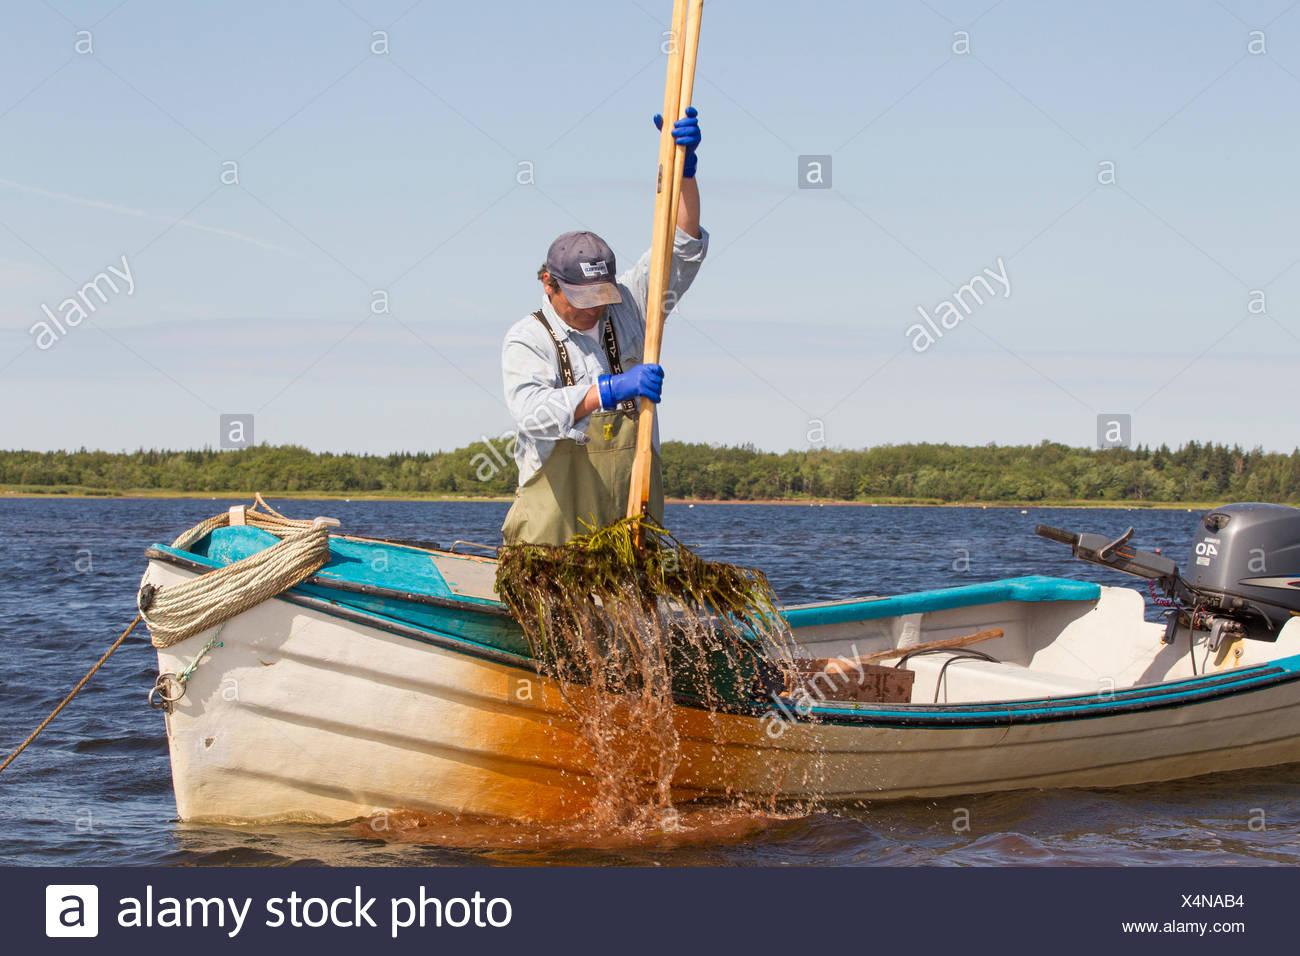 Oyster pescatore, West Principe, Prince Edward Island, Canada Immagini Stock